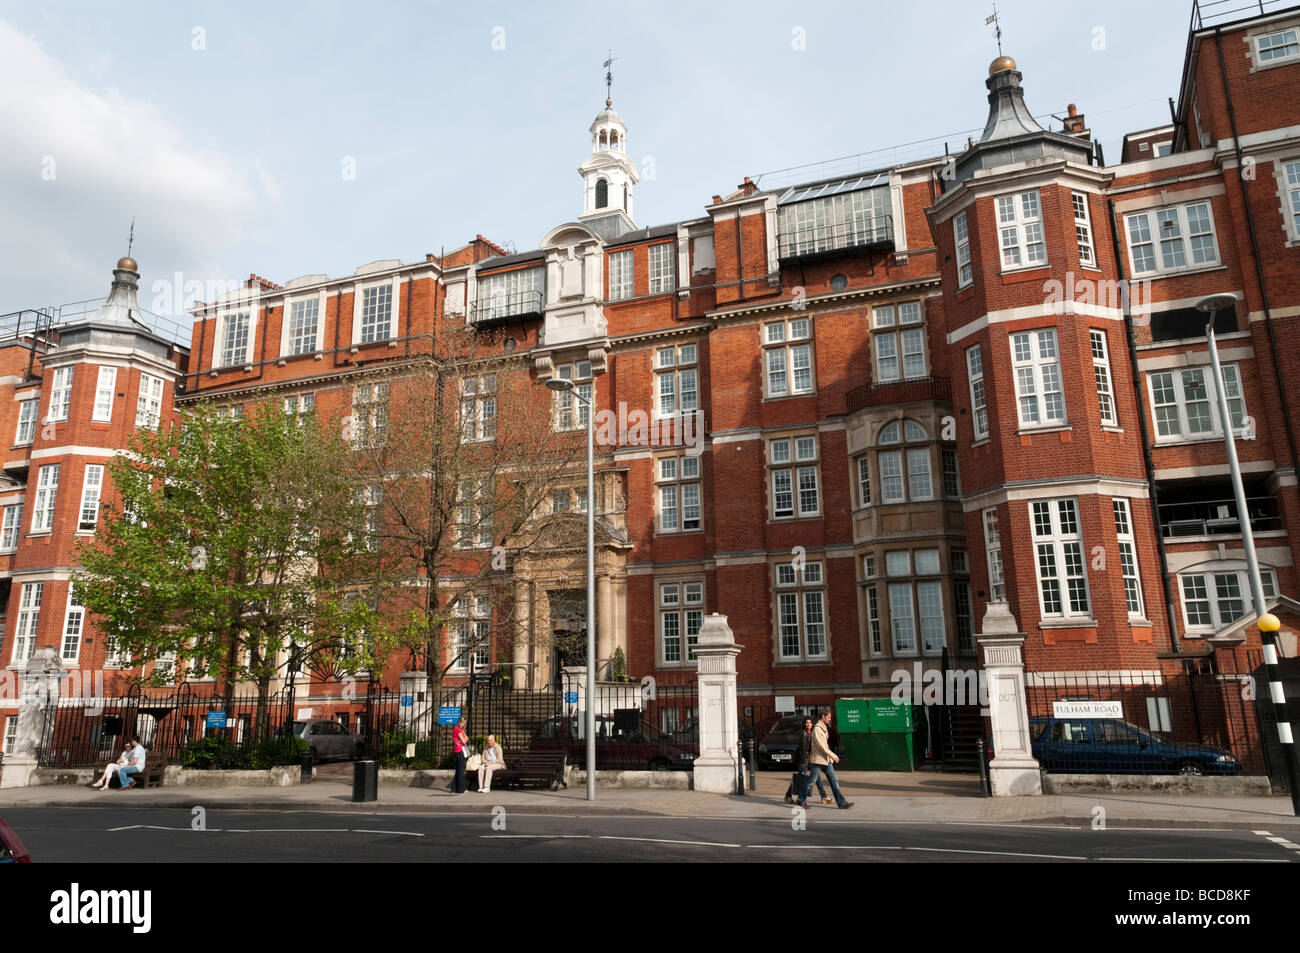 The Royal Marsden Hospital, Chelsea, London, England Britain UK - Stock Image